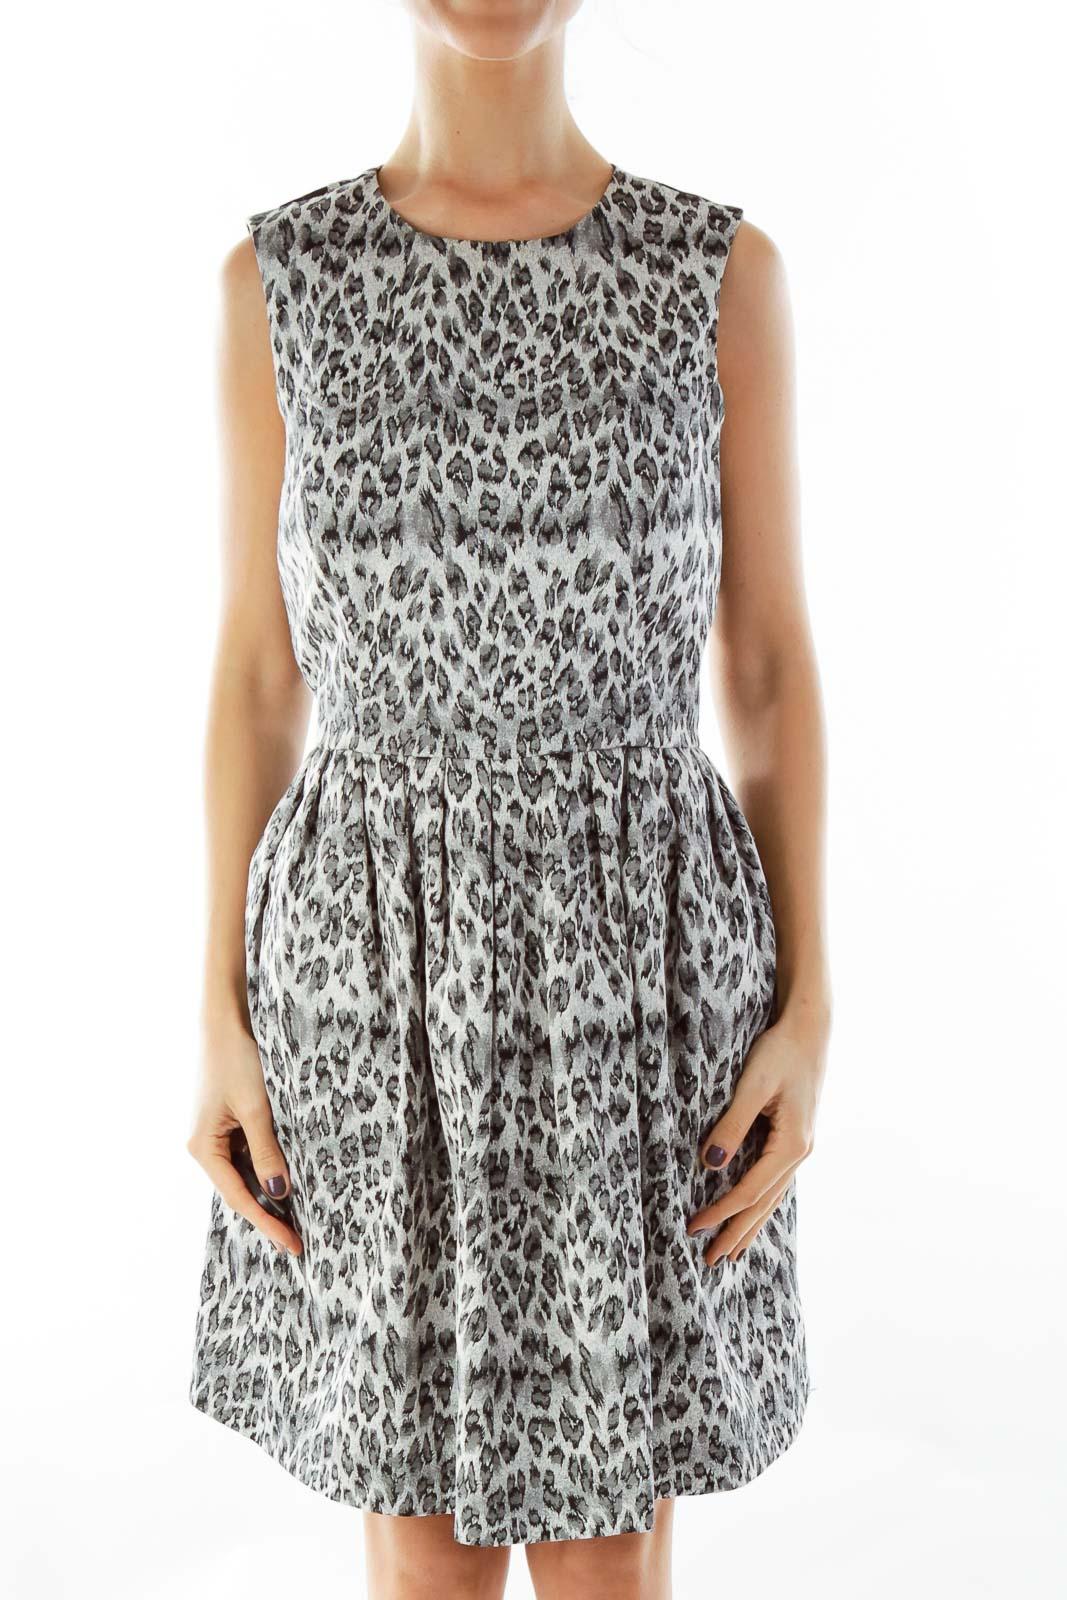 Gray Leopard Print Dress Front